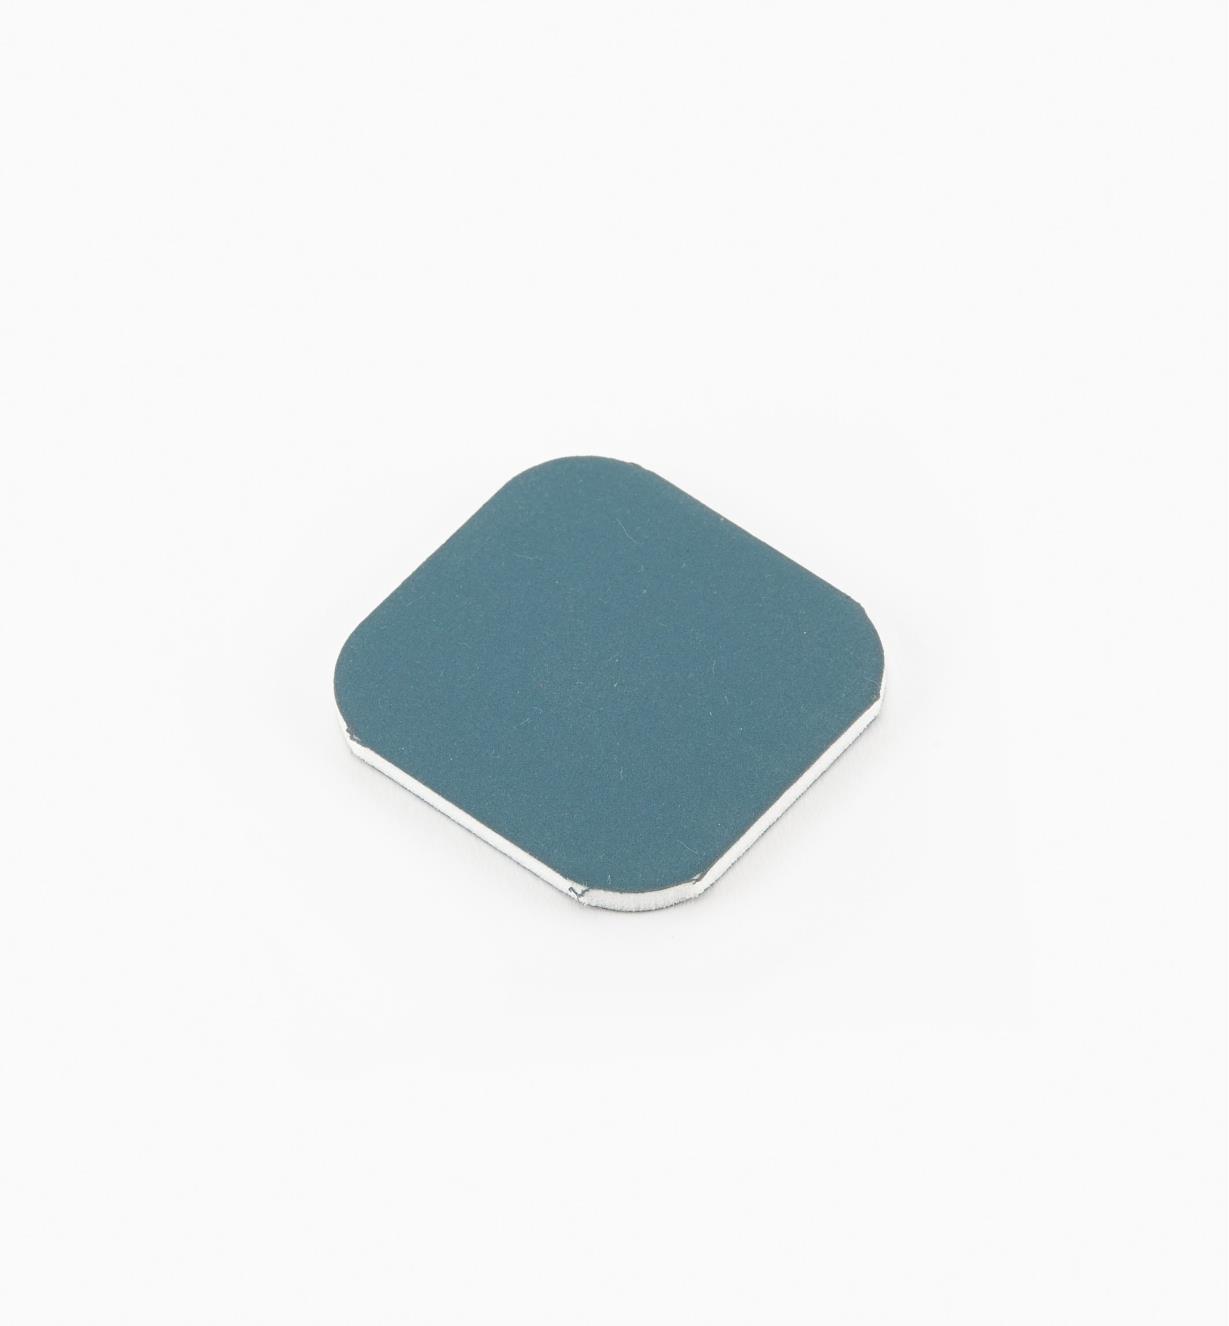 54K9015 - 4000x Micro-Mesh Pen-Sanding Pad, each